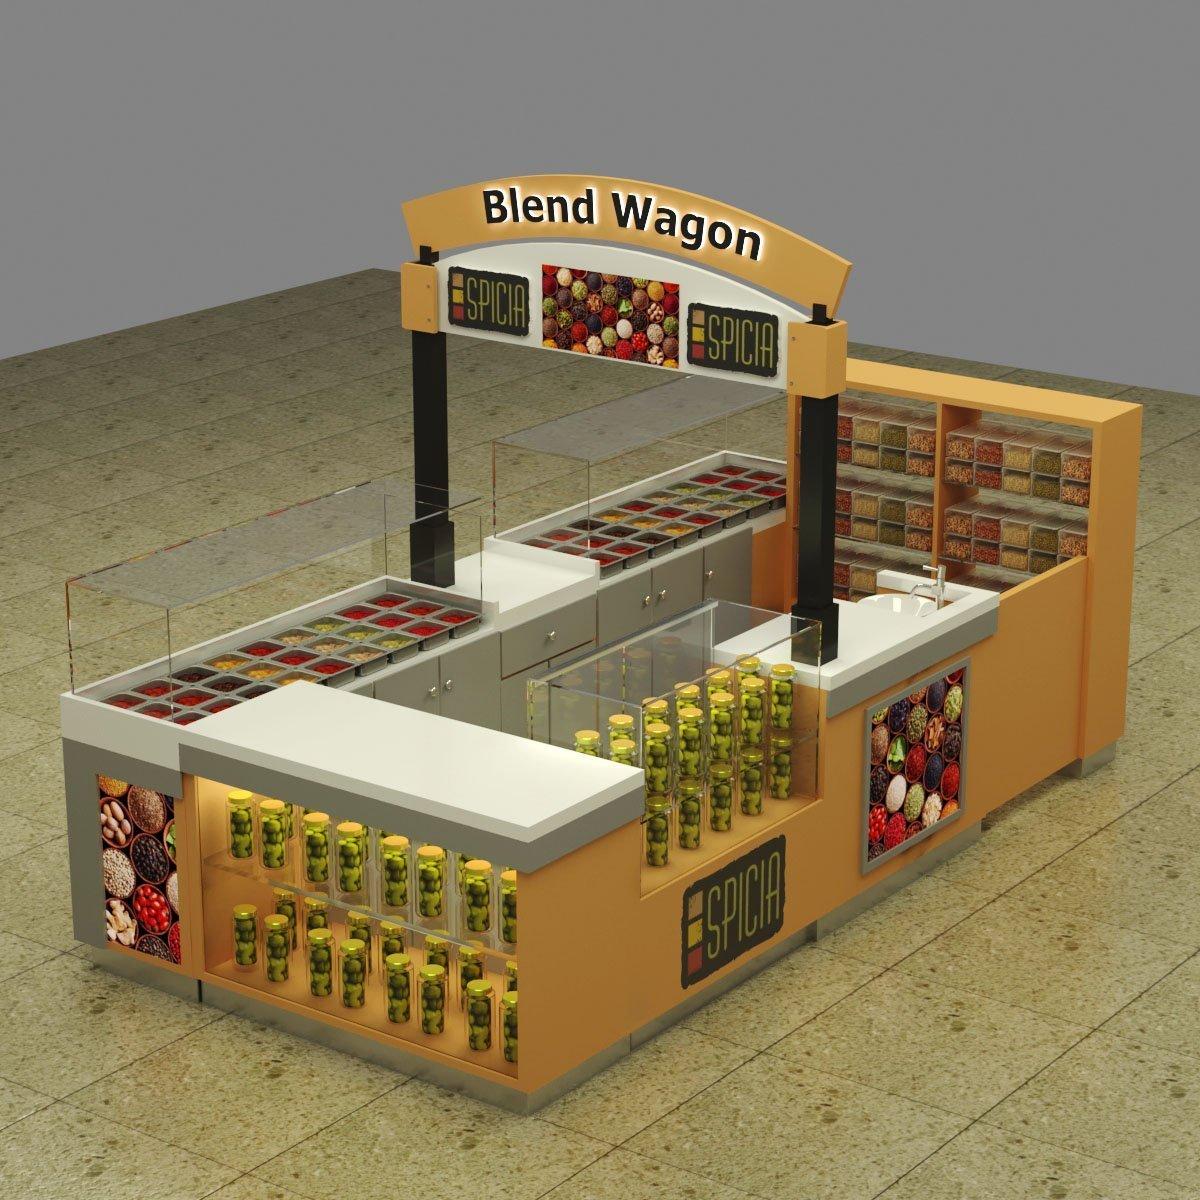 spices display kiosk